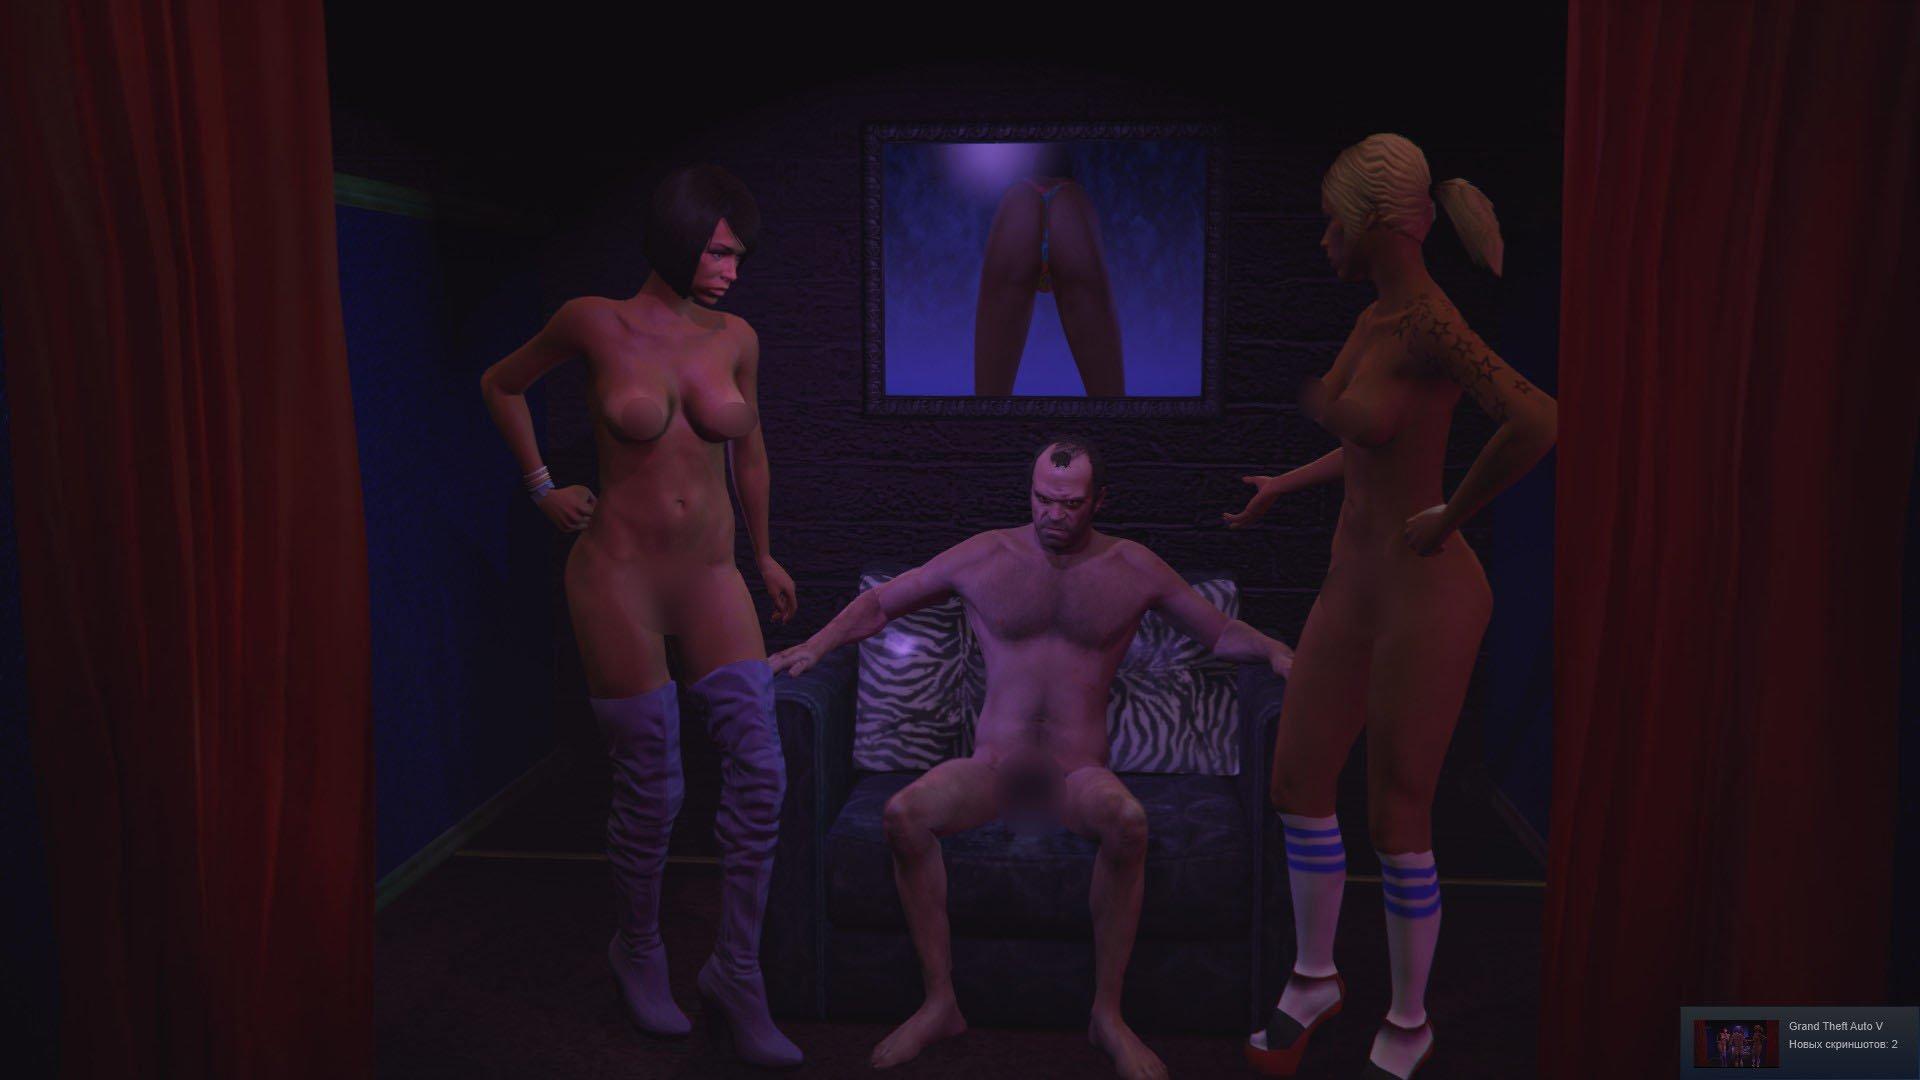 Stripper nude Strip: 4,110